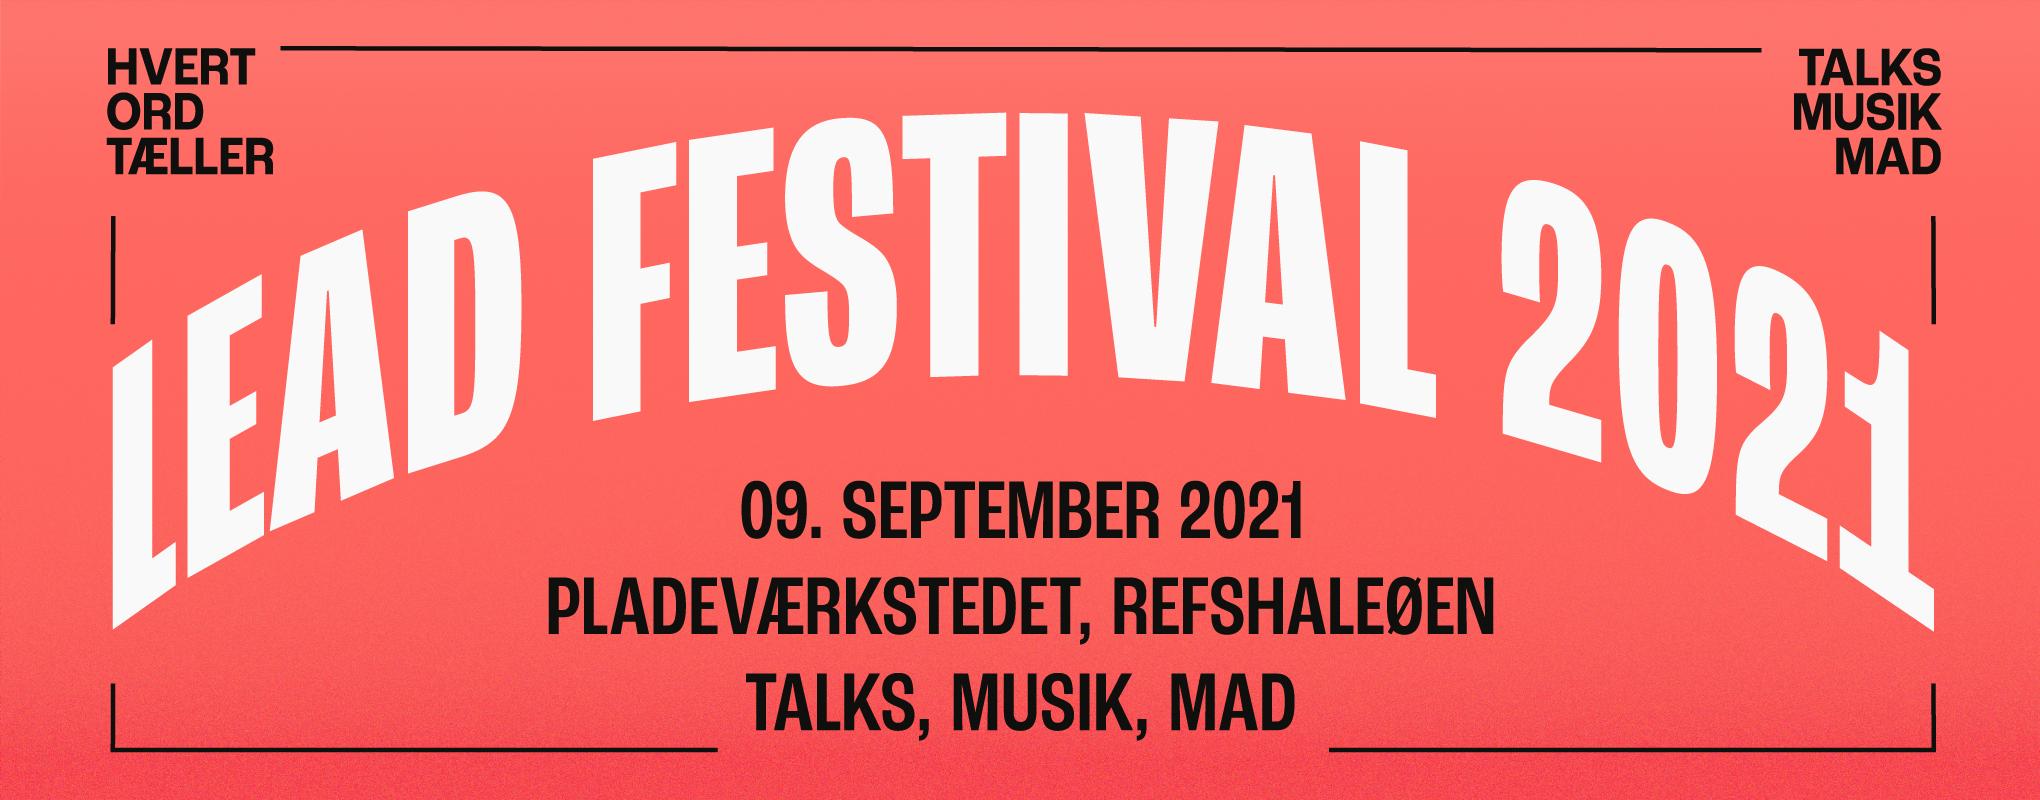 LEAD FESTIVAL 2021